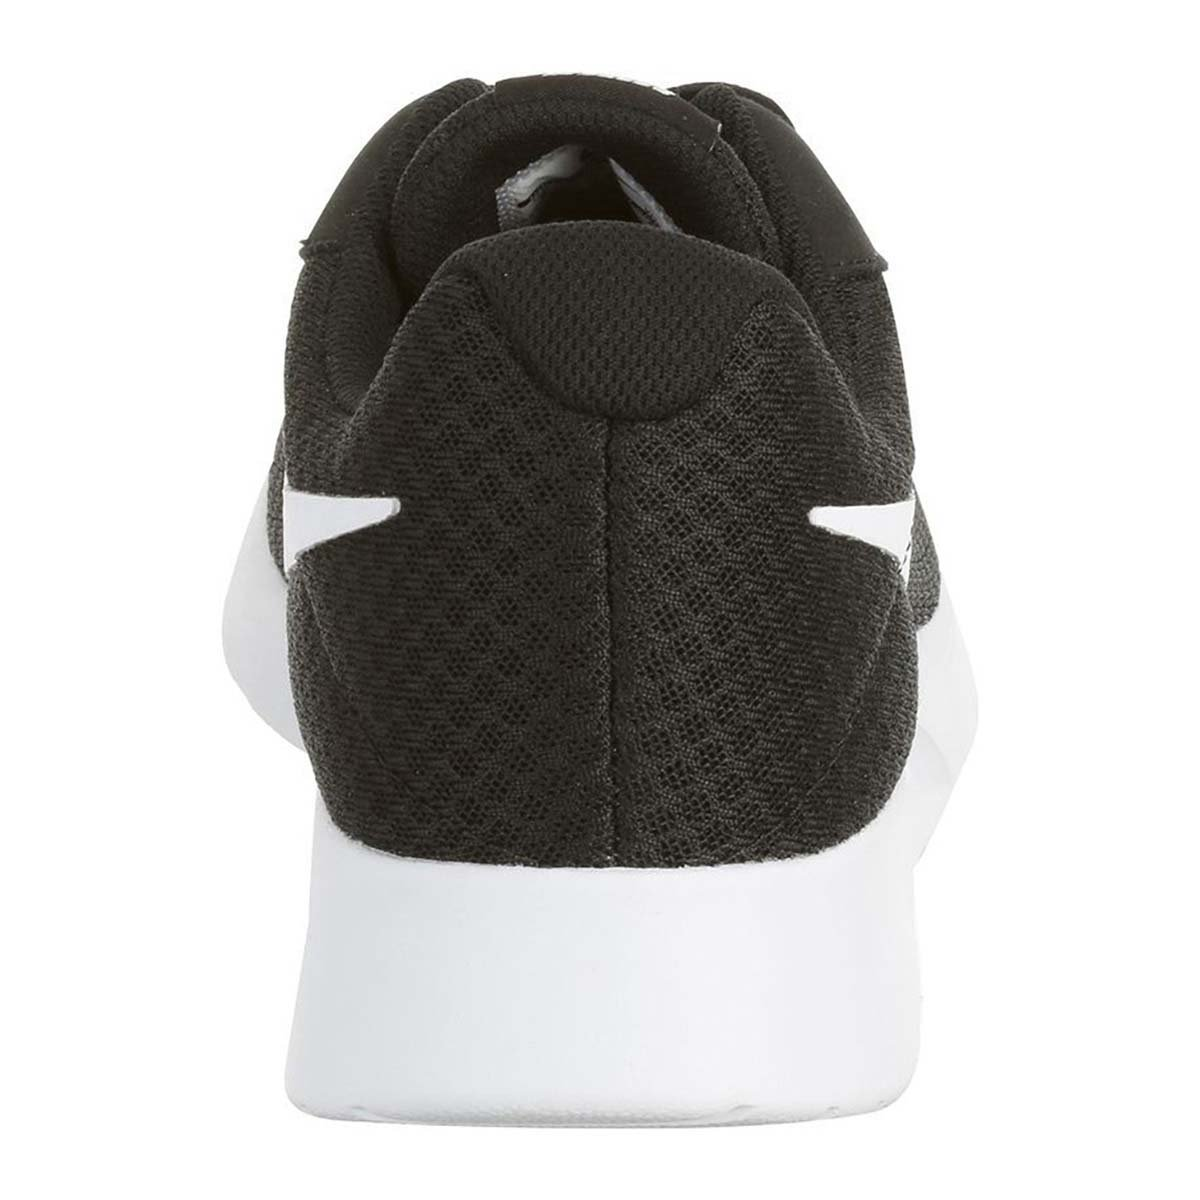 Nike Youth Tanjun Textile Black White Trainers 4.5 US